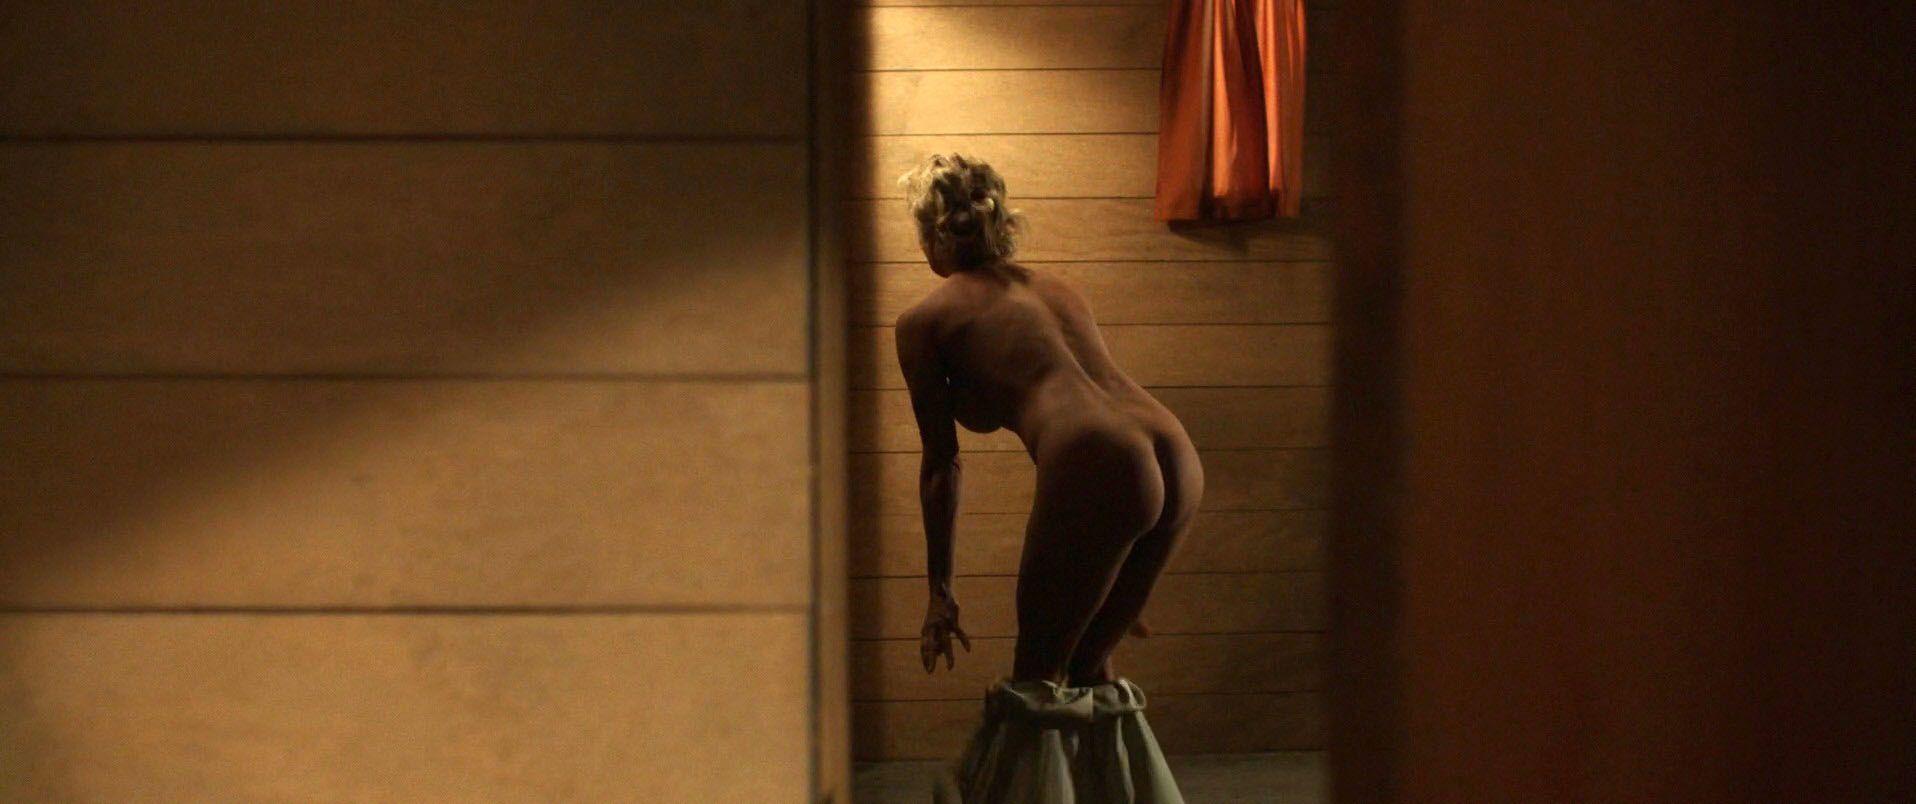 Pamela Anderson Nude 4 Sn6524